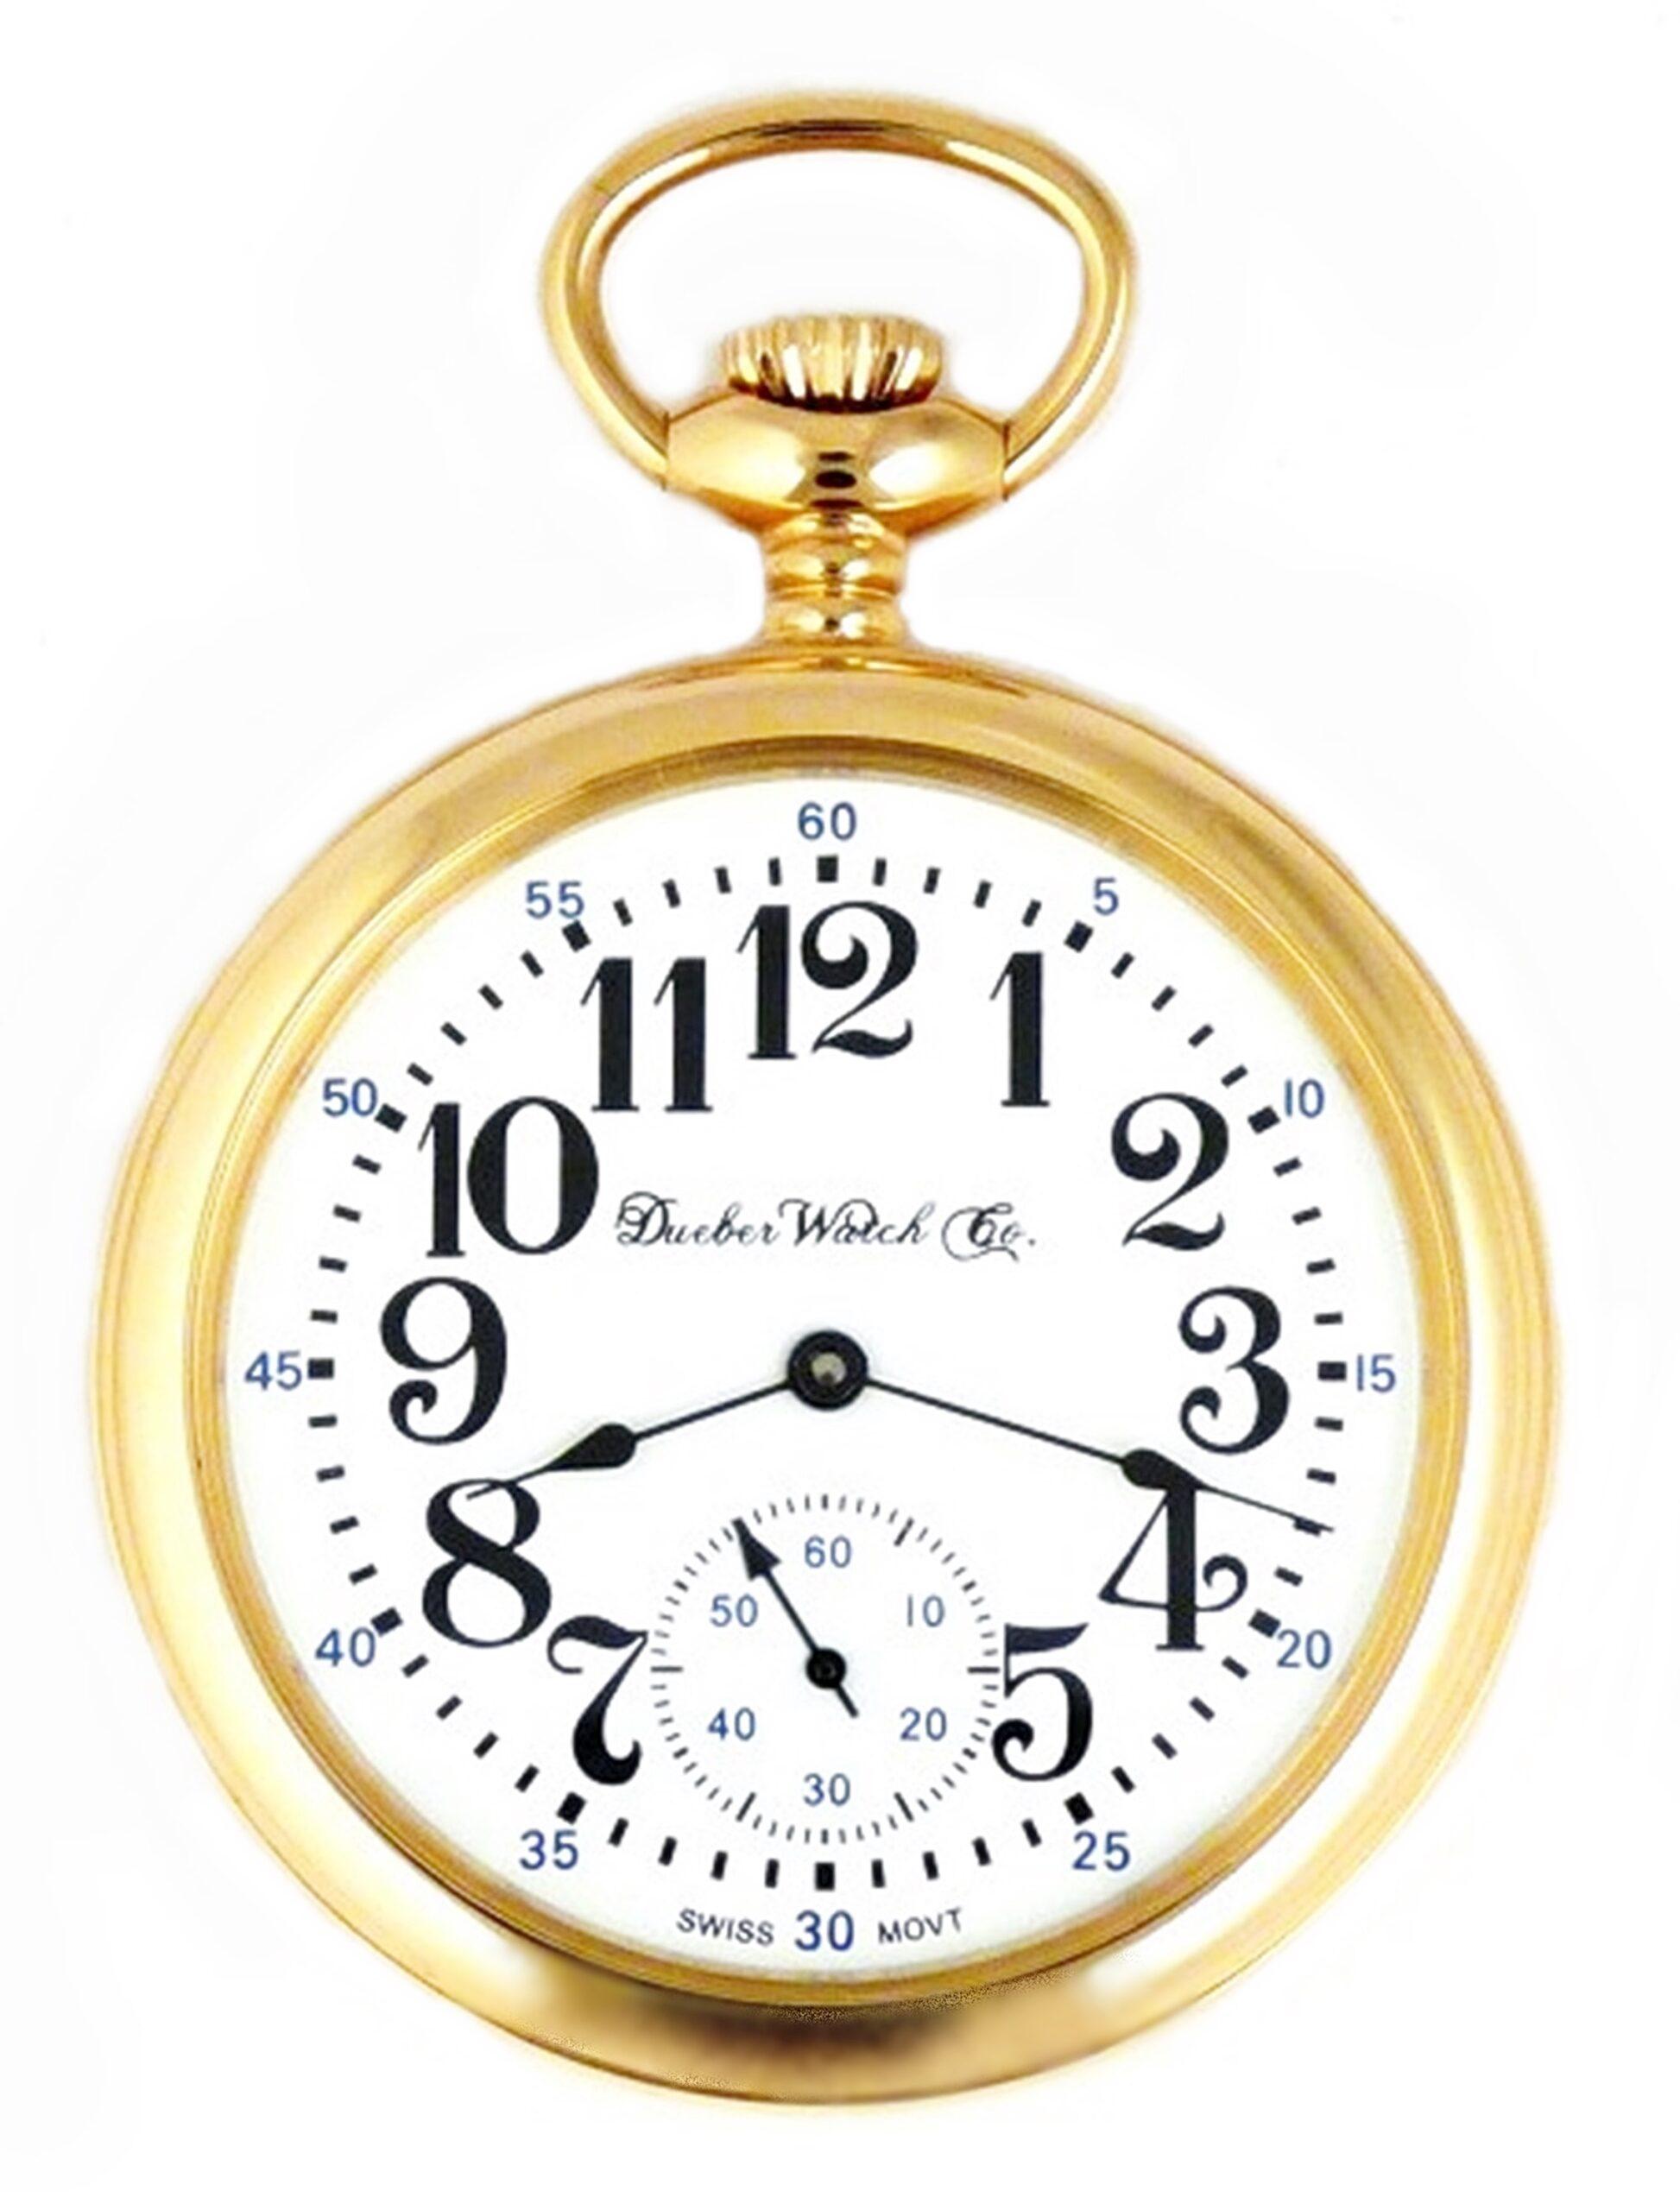 Dueber Swiss Pocket Watch